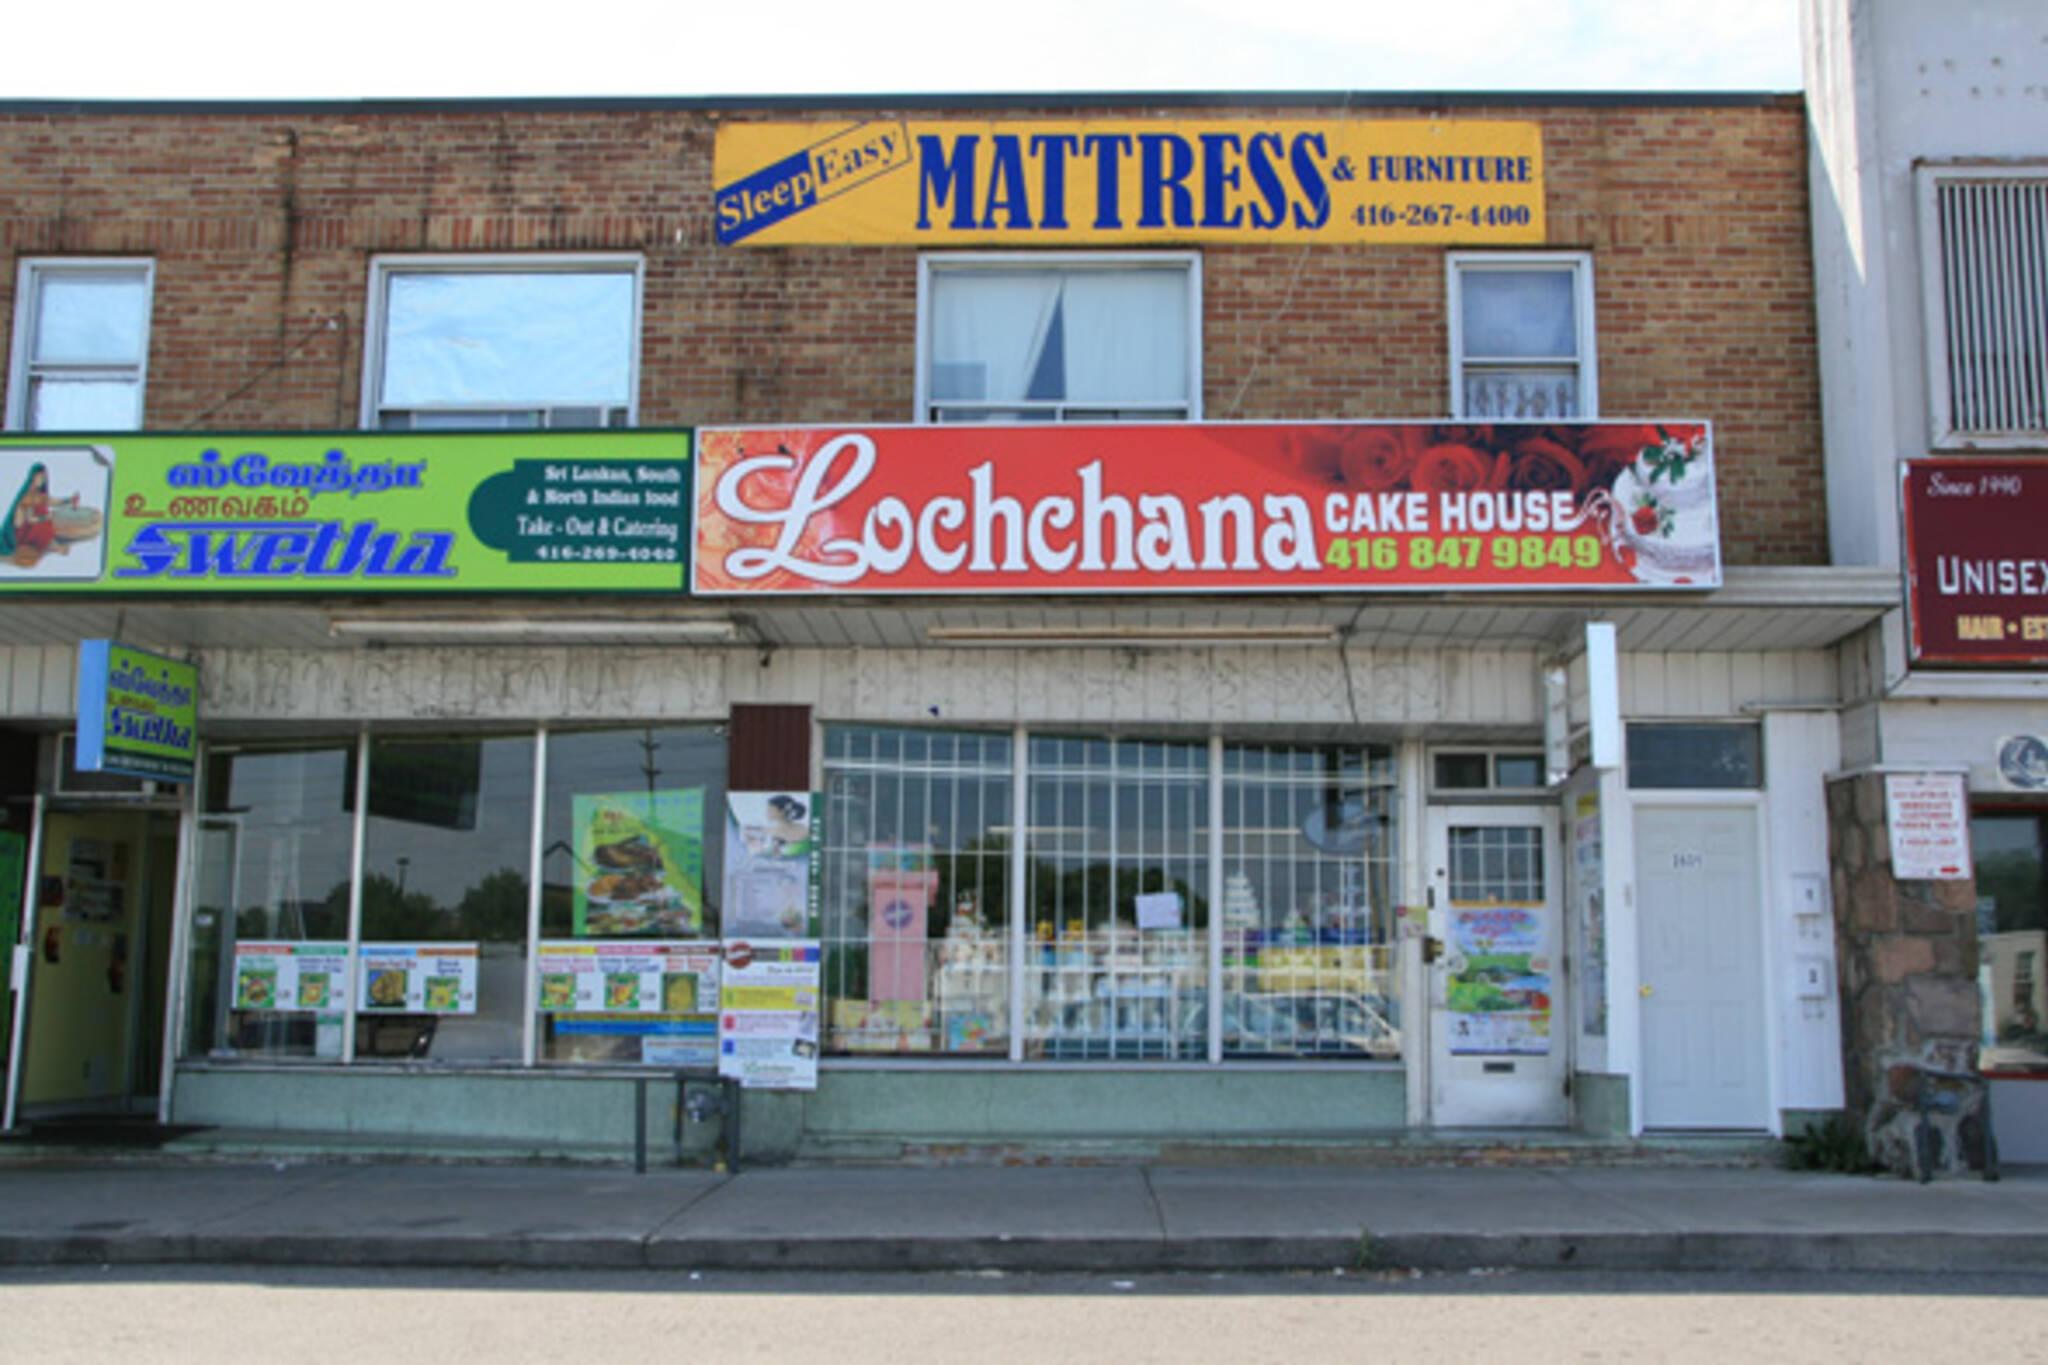 Lochchana Cake House